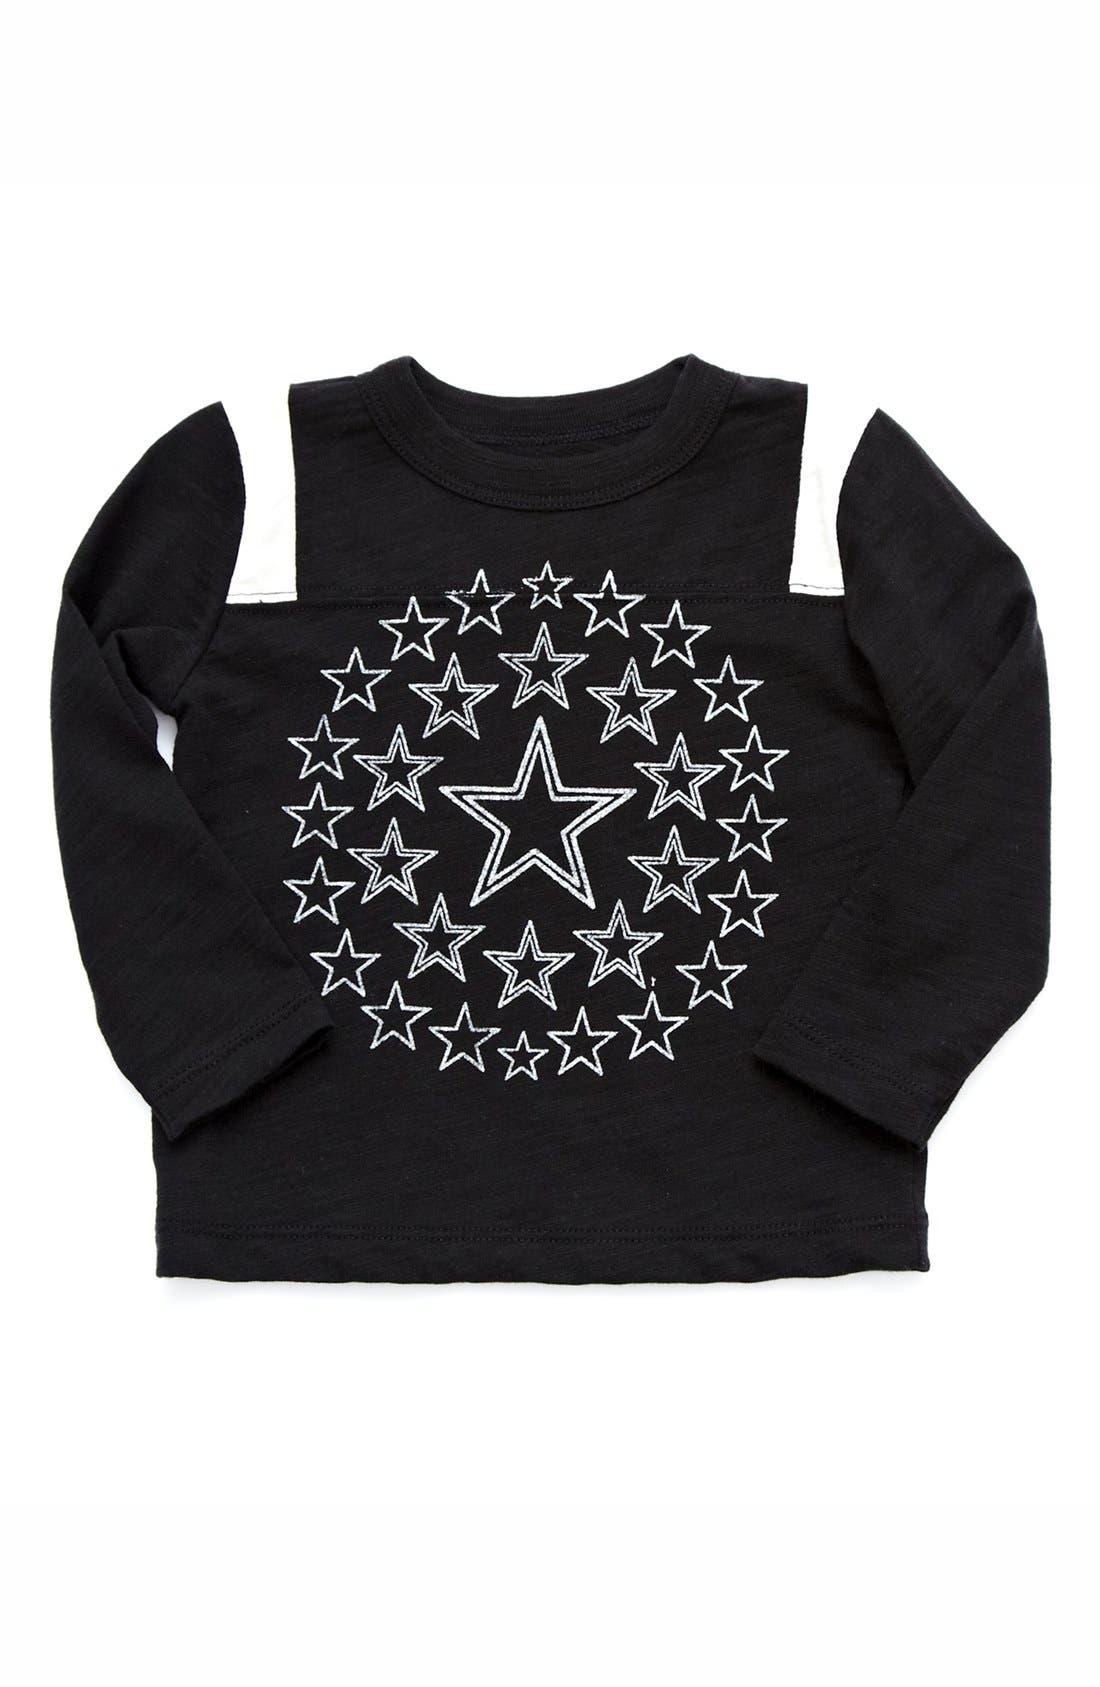 Alternate Image 1 Selected - Peek 'Stars' Long Sleeve T-Shirt (Baby Boys)